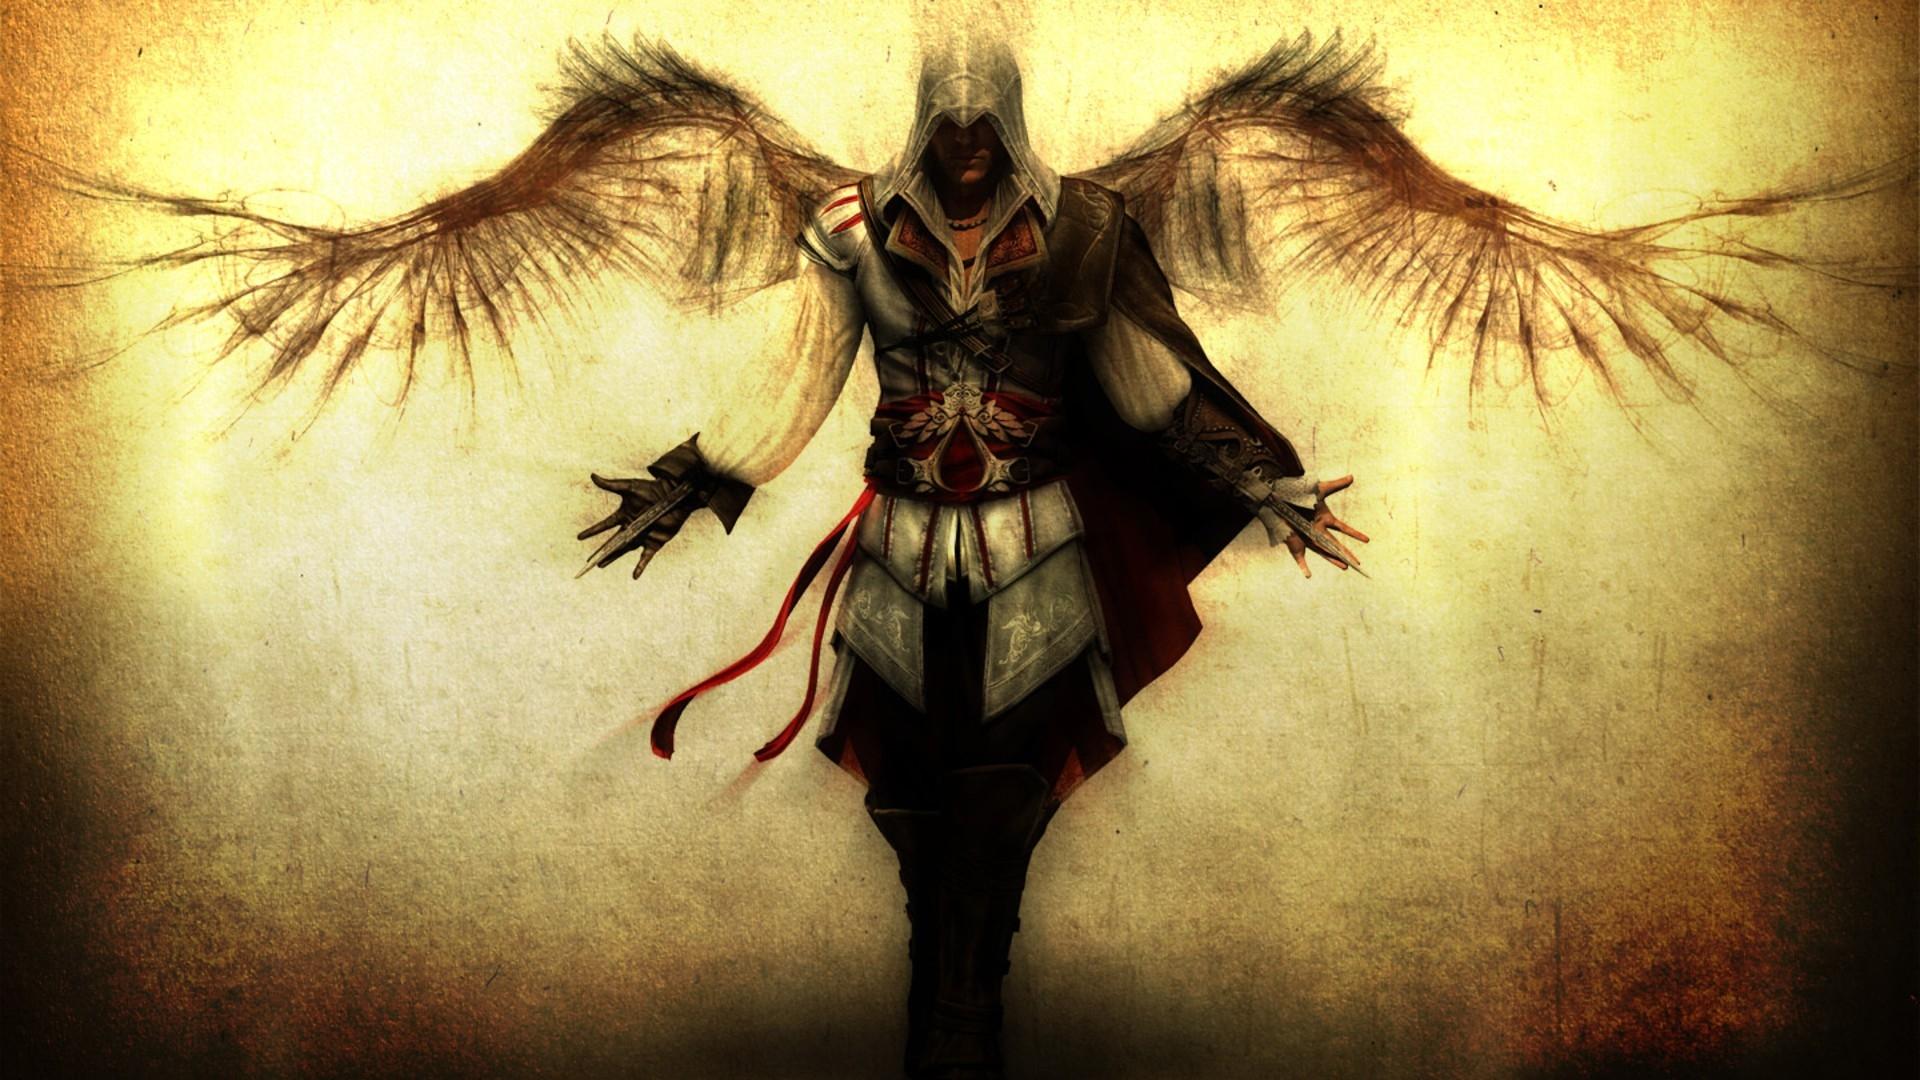 Wallpaper Assassins Creed Desmond Miles Hands Knifes Wings